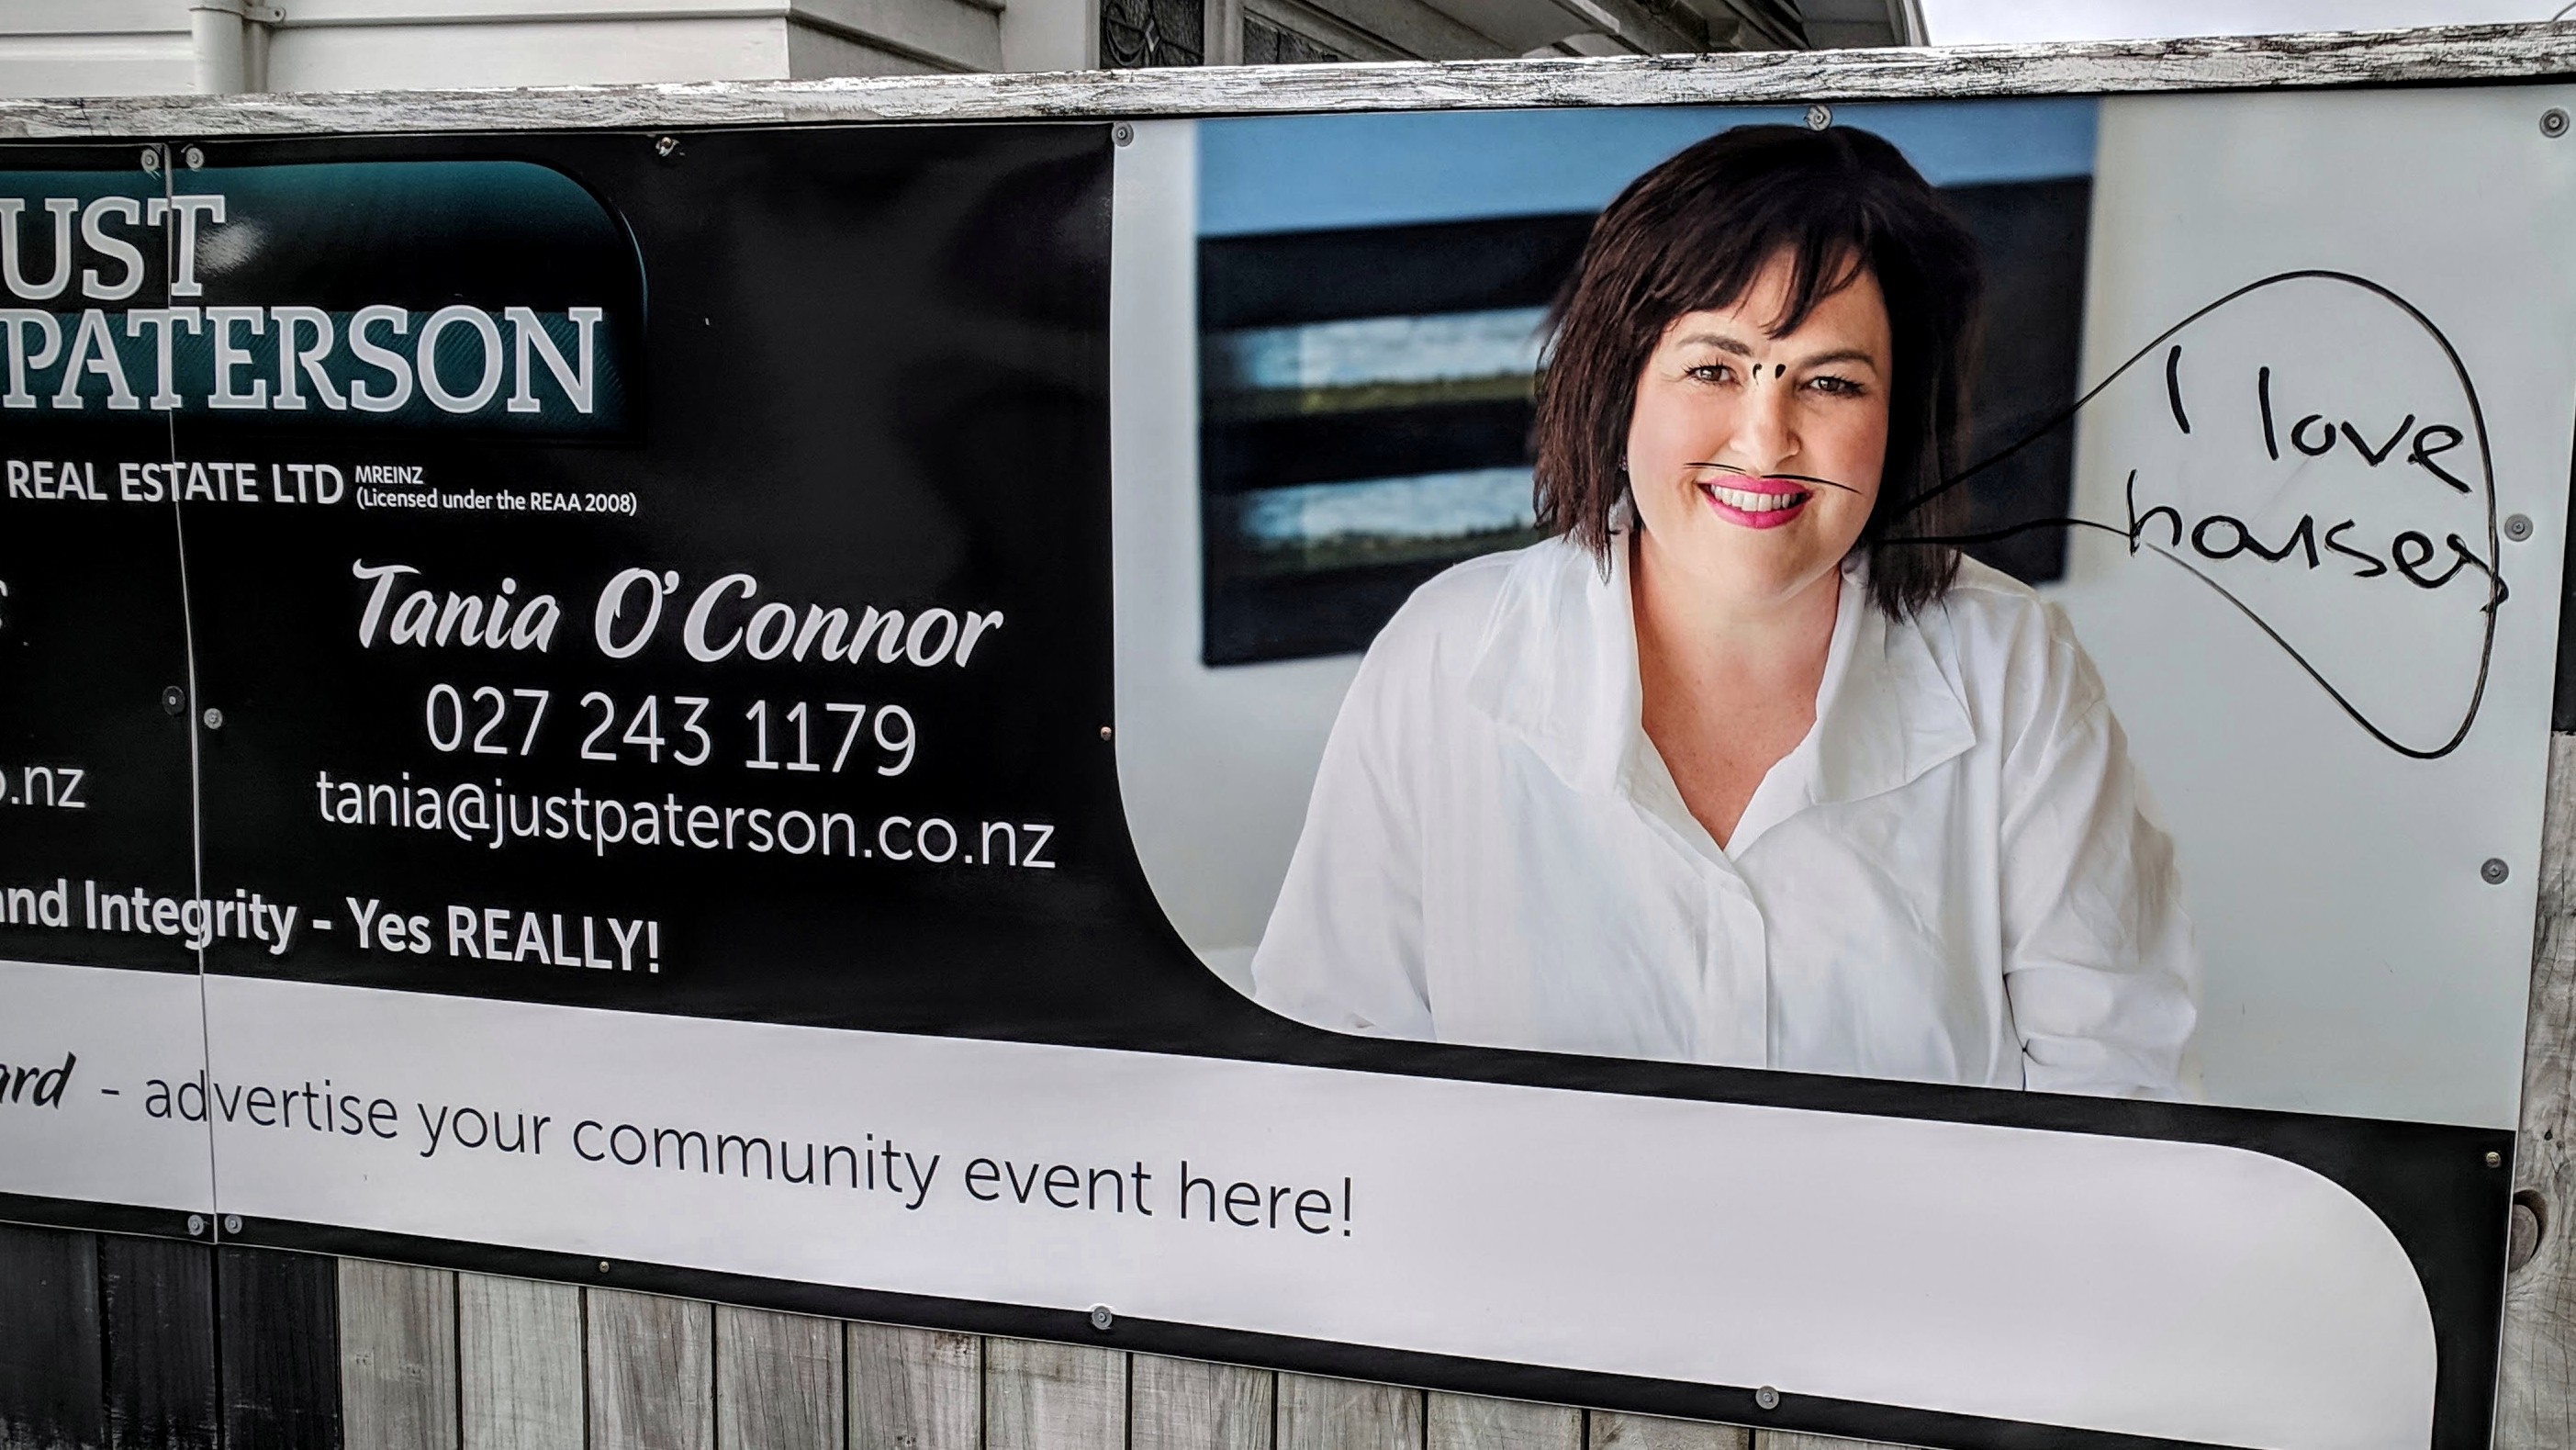 'I love gouses' graffiti on a real estate agent advertising hoarding